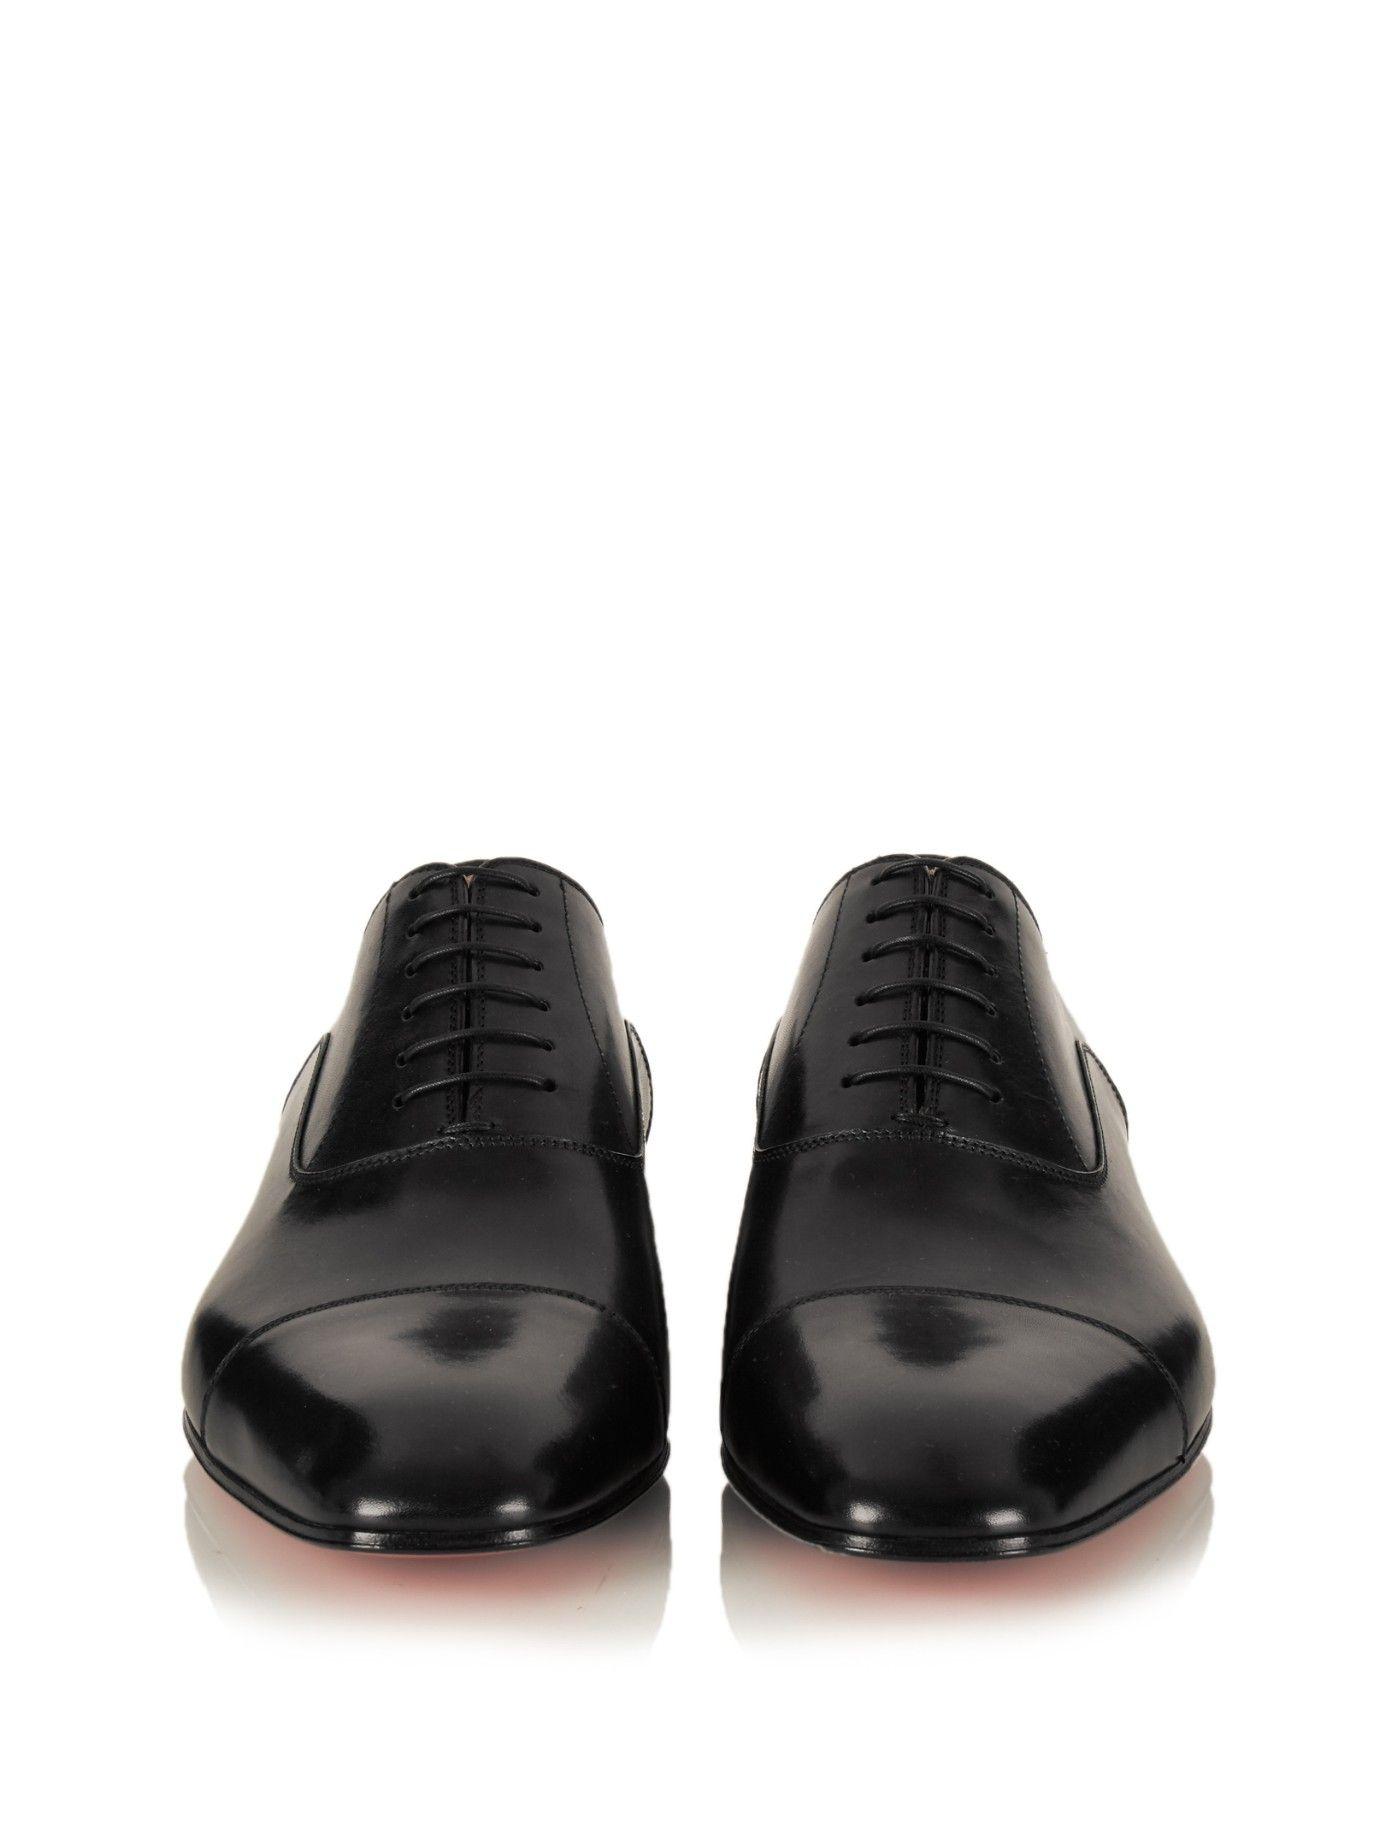 476e4d7b316f Greggo leather lace-up shoes